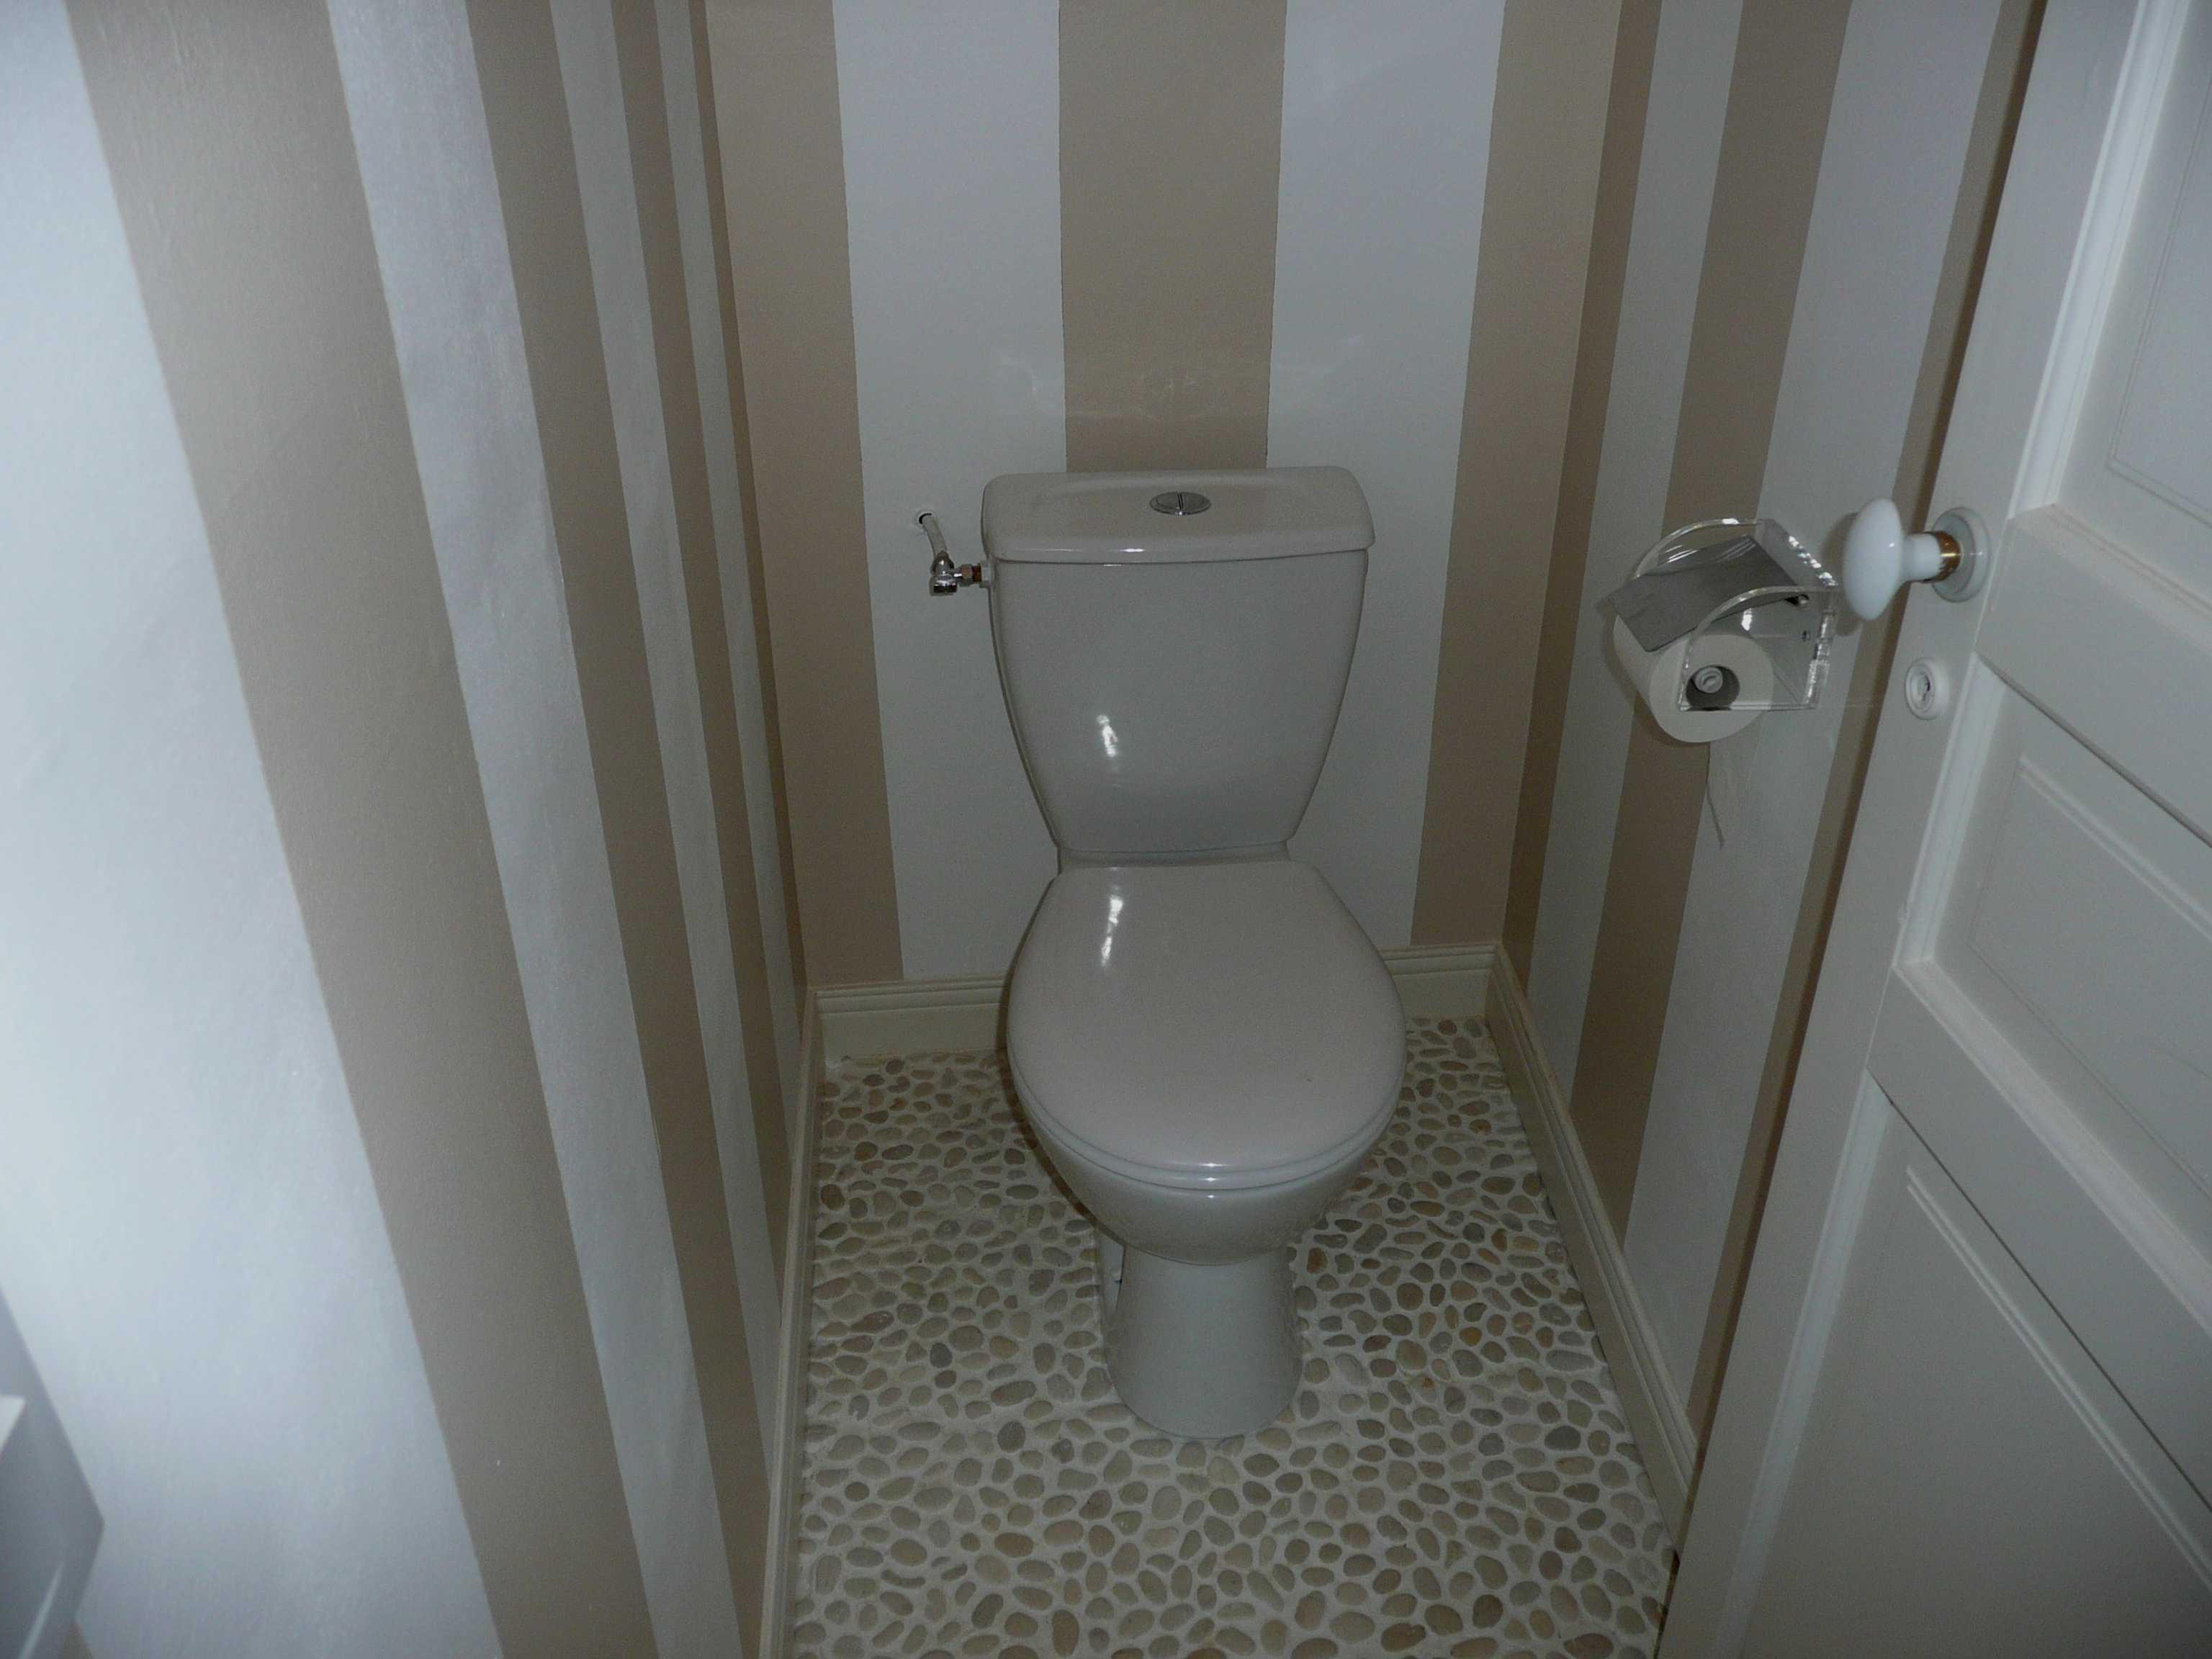 galet salle de bain nettoyage - Carrelage Galets Salle De Bain